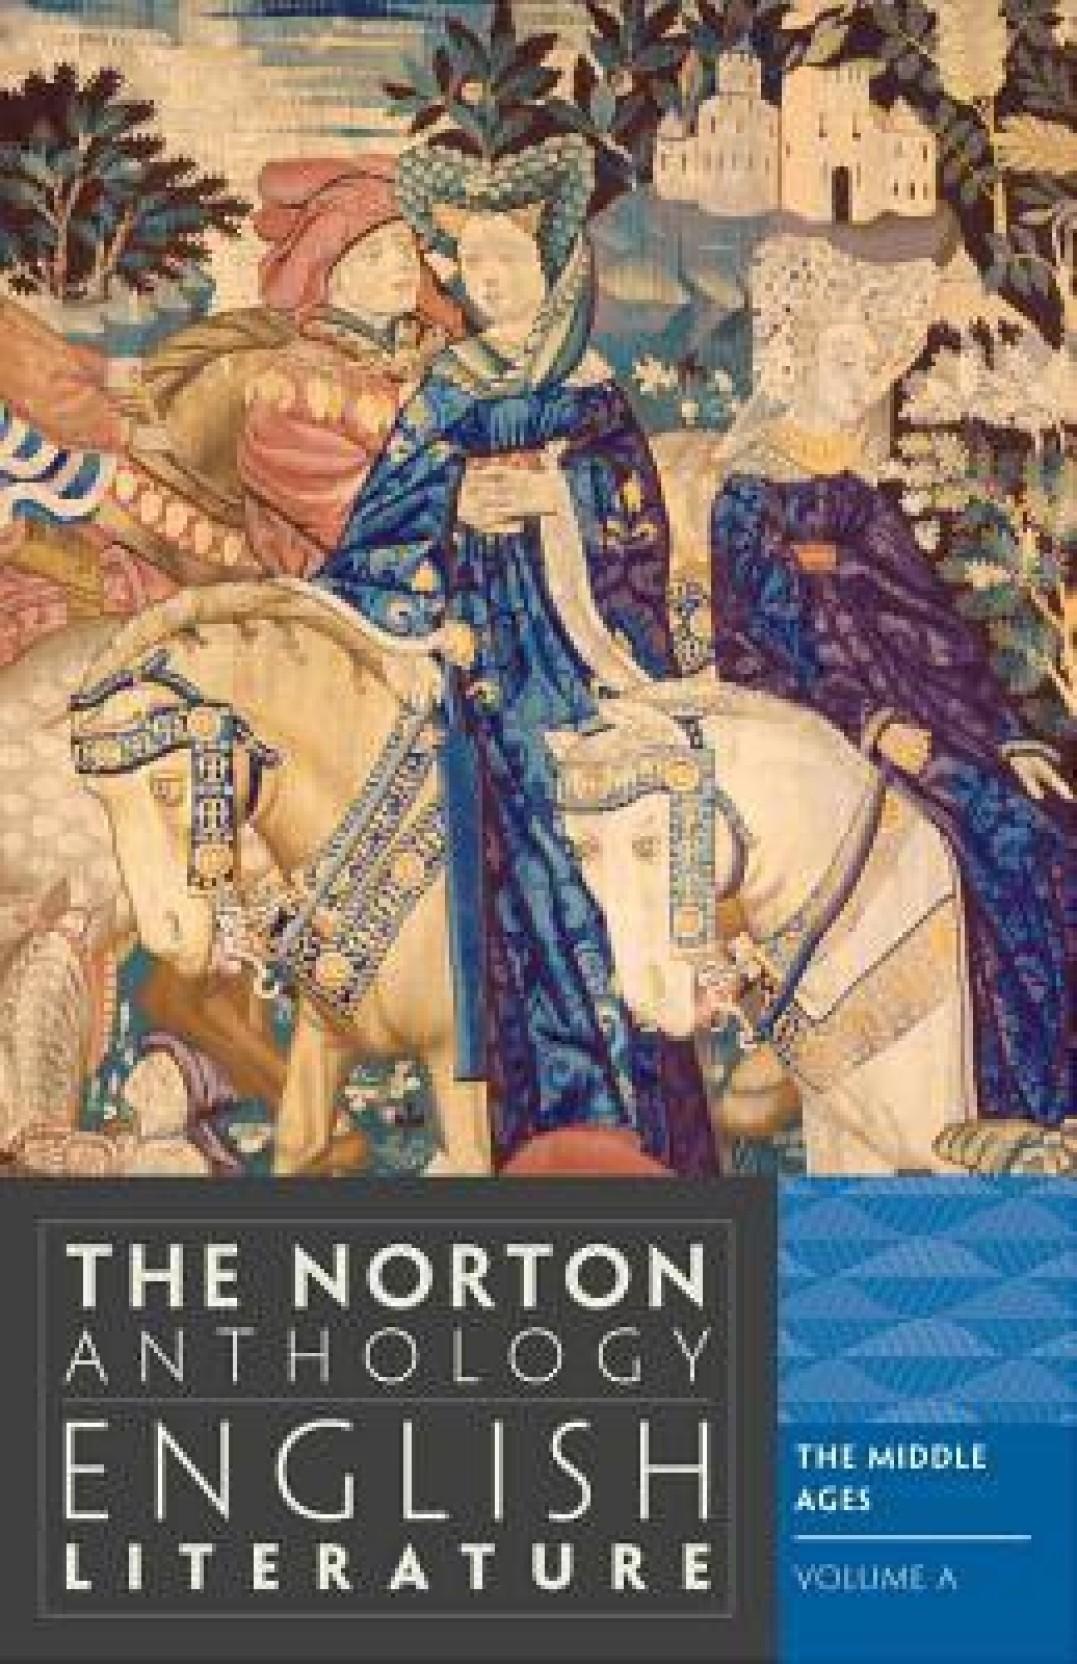 an analysis of the norton anthology of english literature The norton anthology of english literature (ninth edition) (vol b) the norton anthology of english literature (ninth edition) (vol d) the norton anthology of.